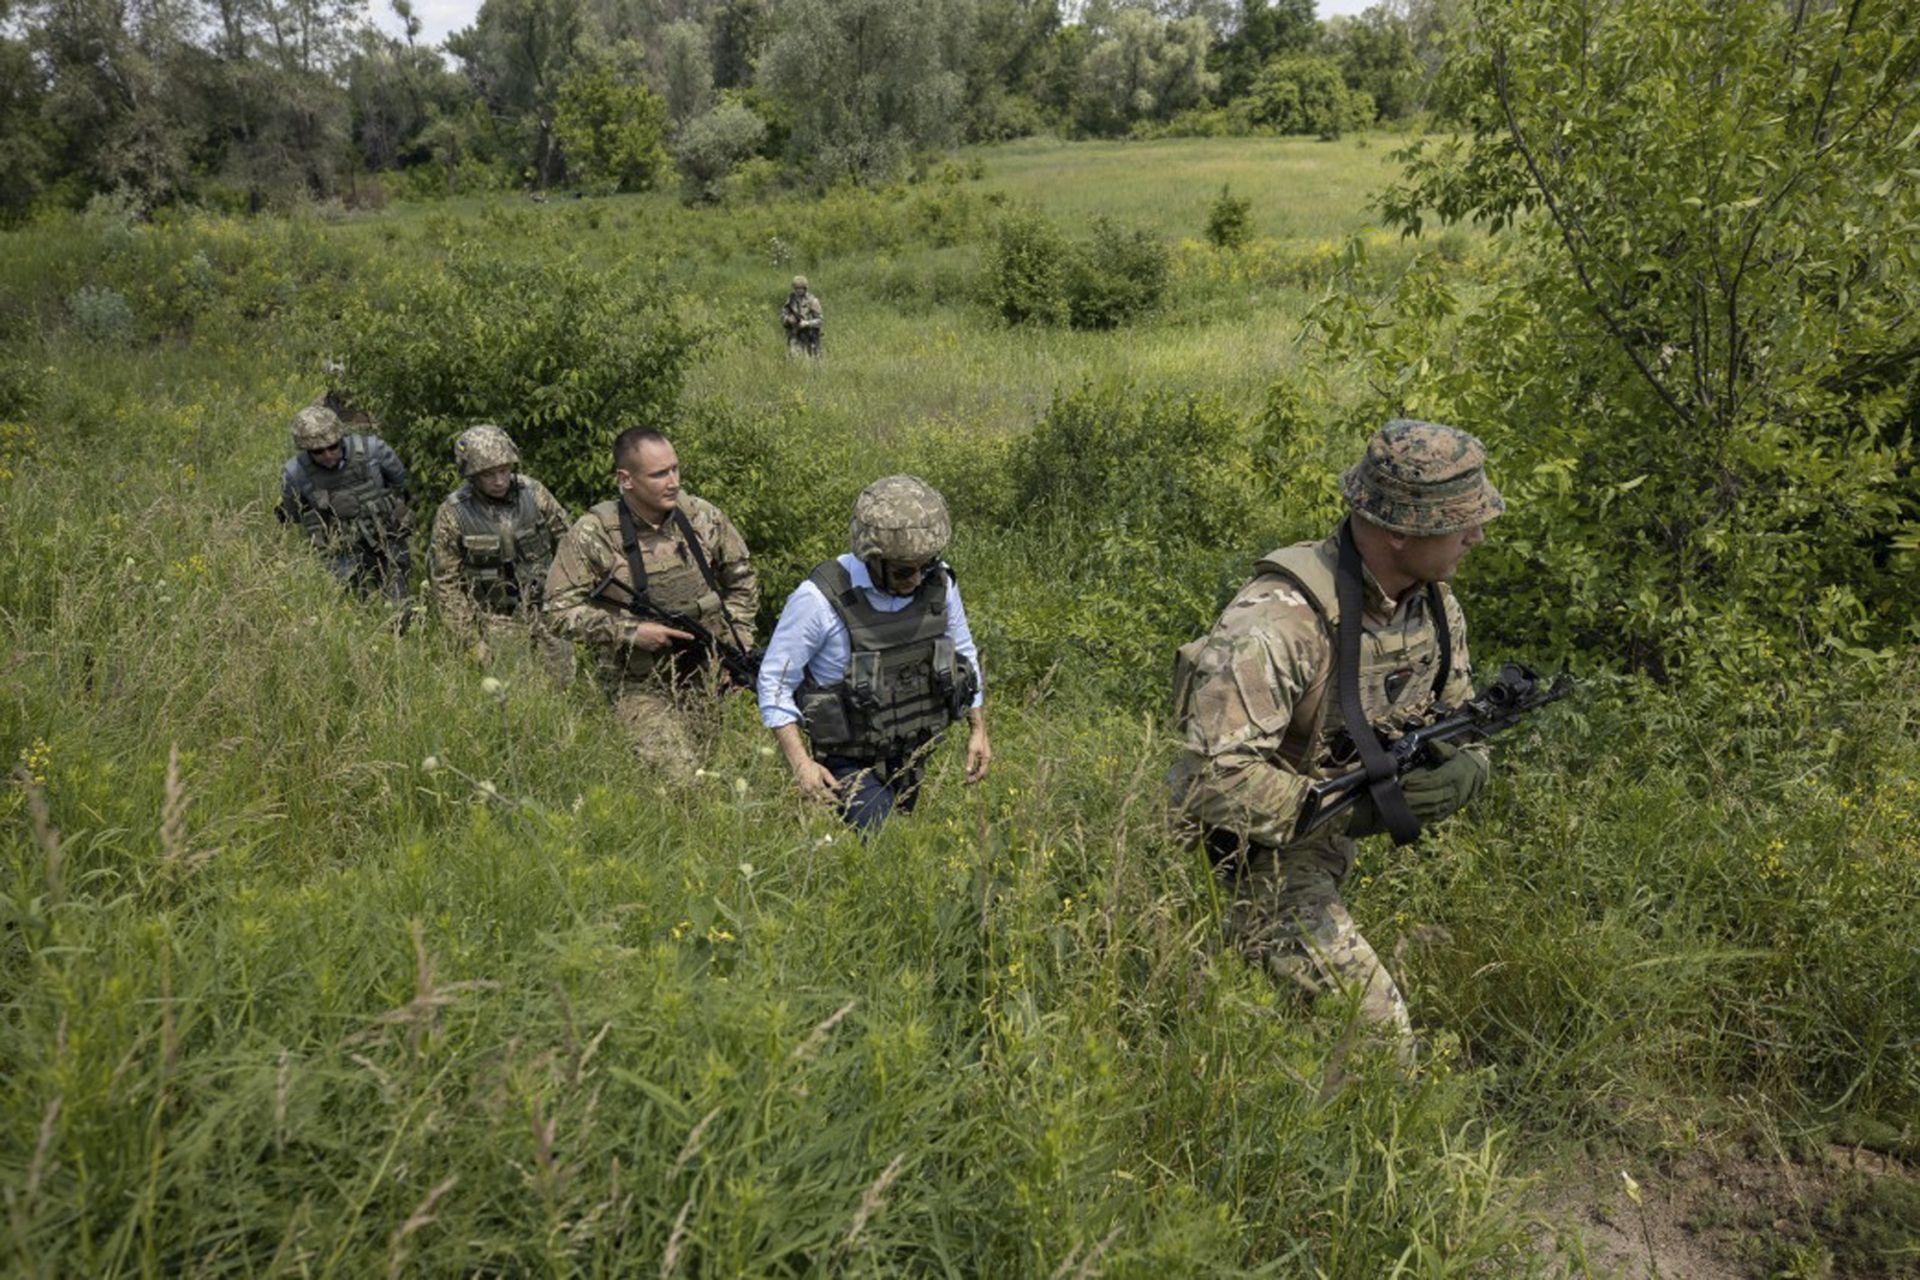 Новият украински президент посети военни позиции в района на Луганск